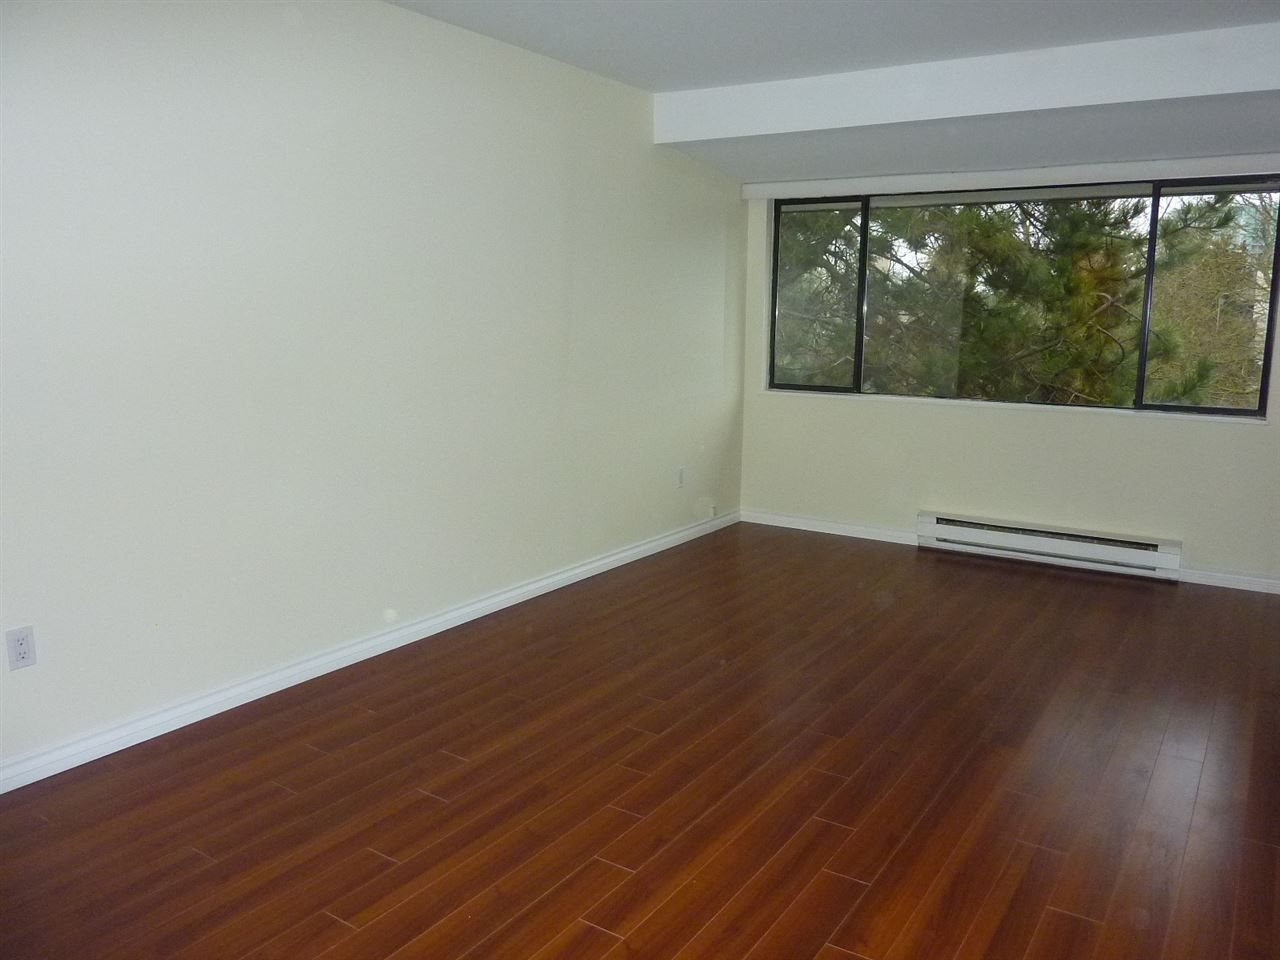 Hardwood Flooring Richmond Bc Of 311 7295 Moffatt Road In Richmond Brighouse south Condo for Sale In Regarding Photo